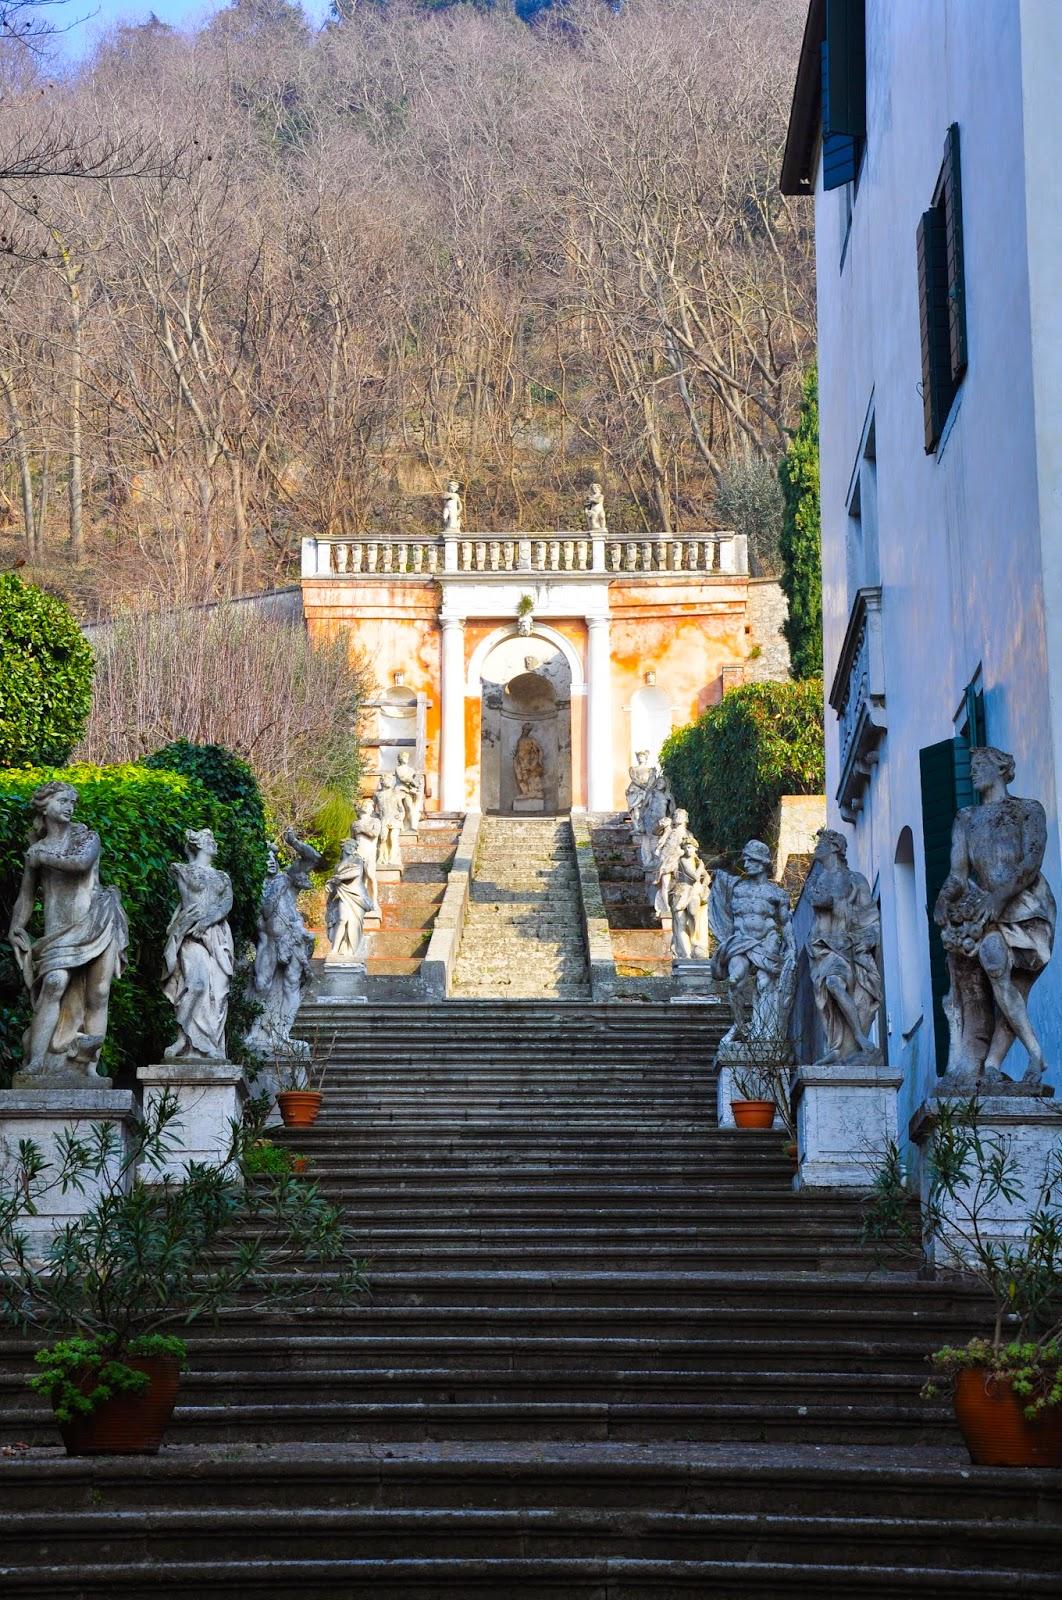 The stairs of the Villa dei Nanni in Monselice, Euganean Hills, Veneto, Italy - www.rossiwrites.com